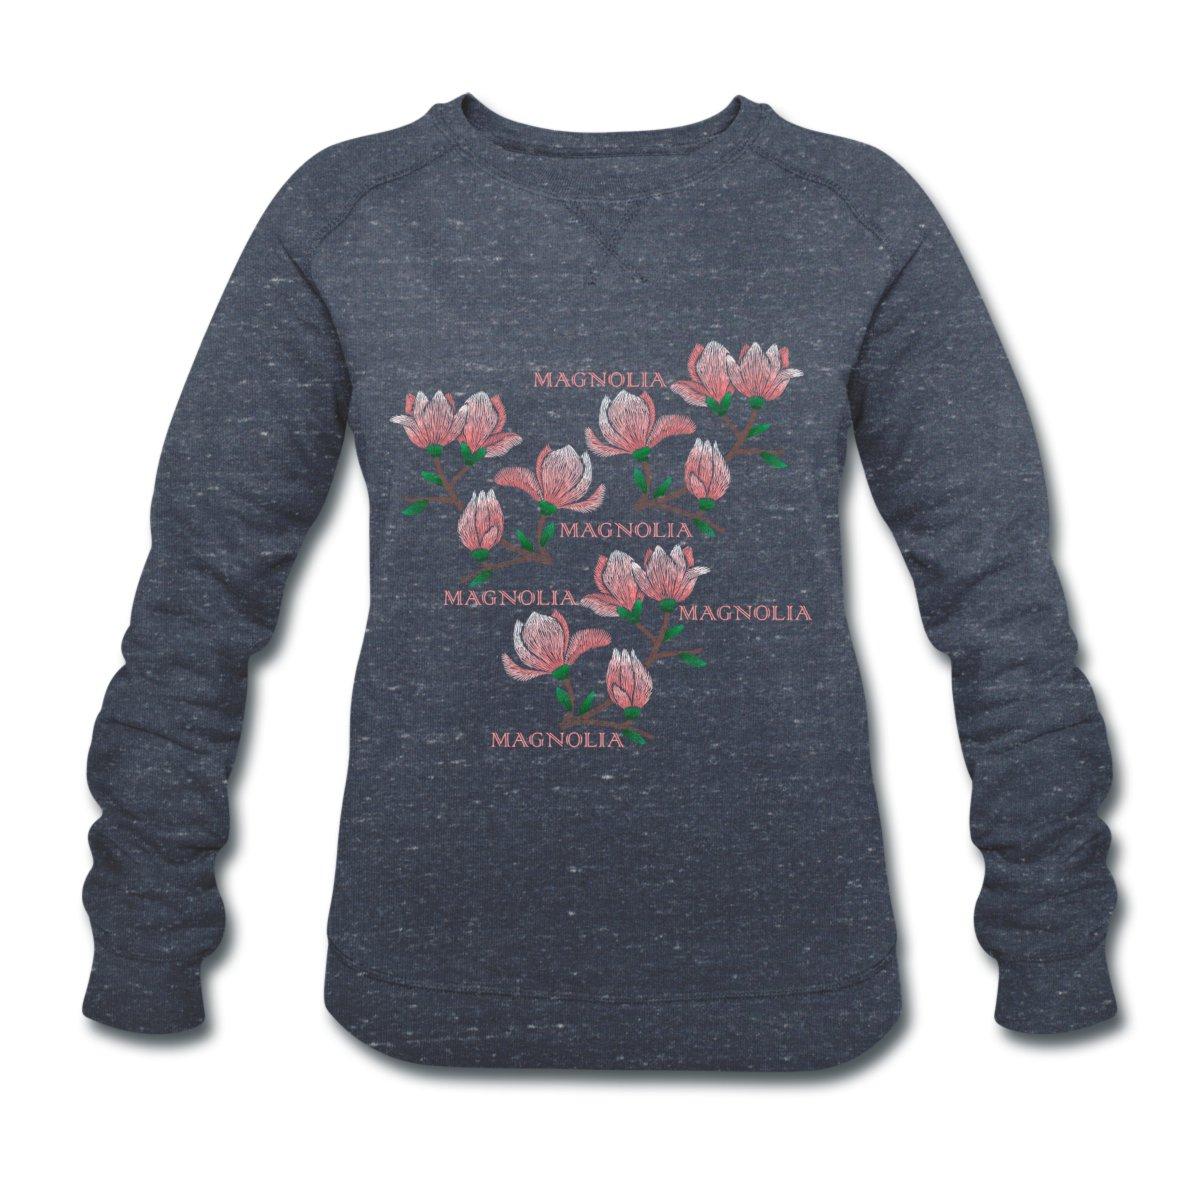 magnolia-sweatshirt-dam-fraan-stanley-stella-mbmelerad.jpg